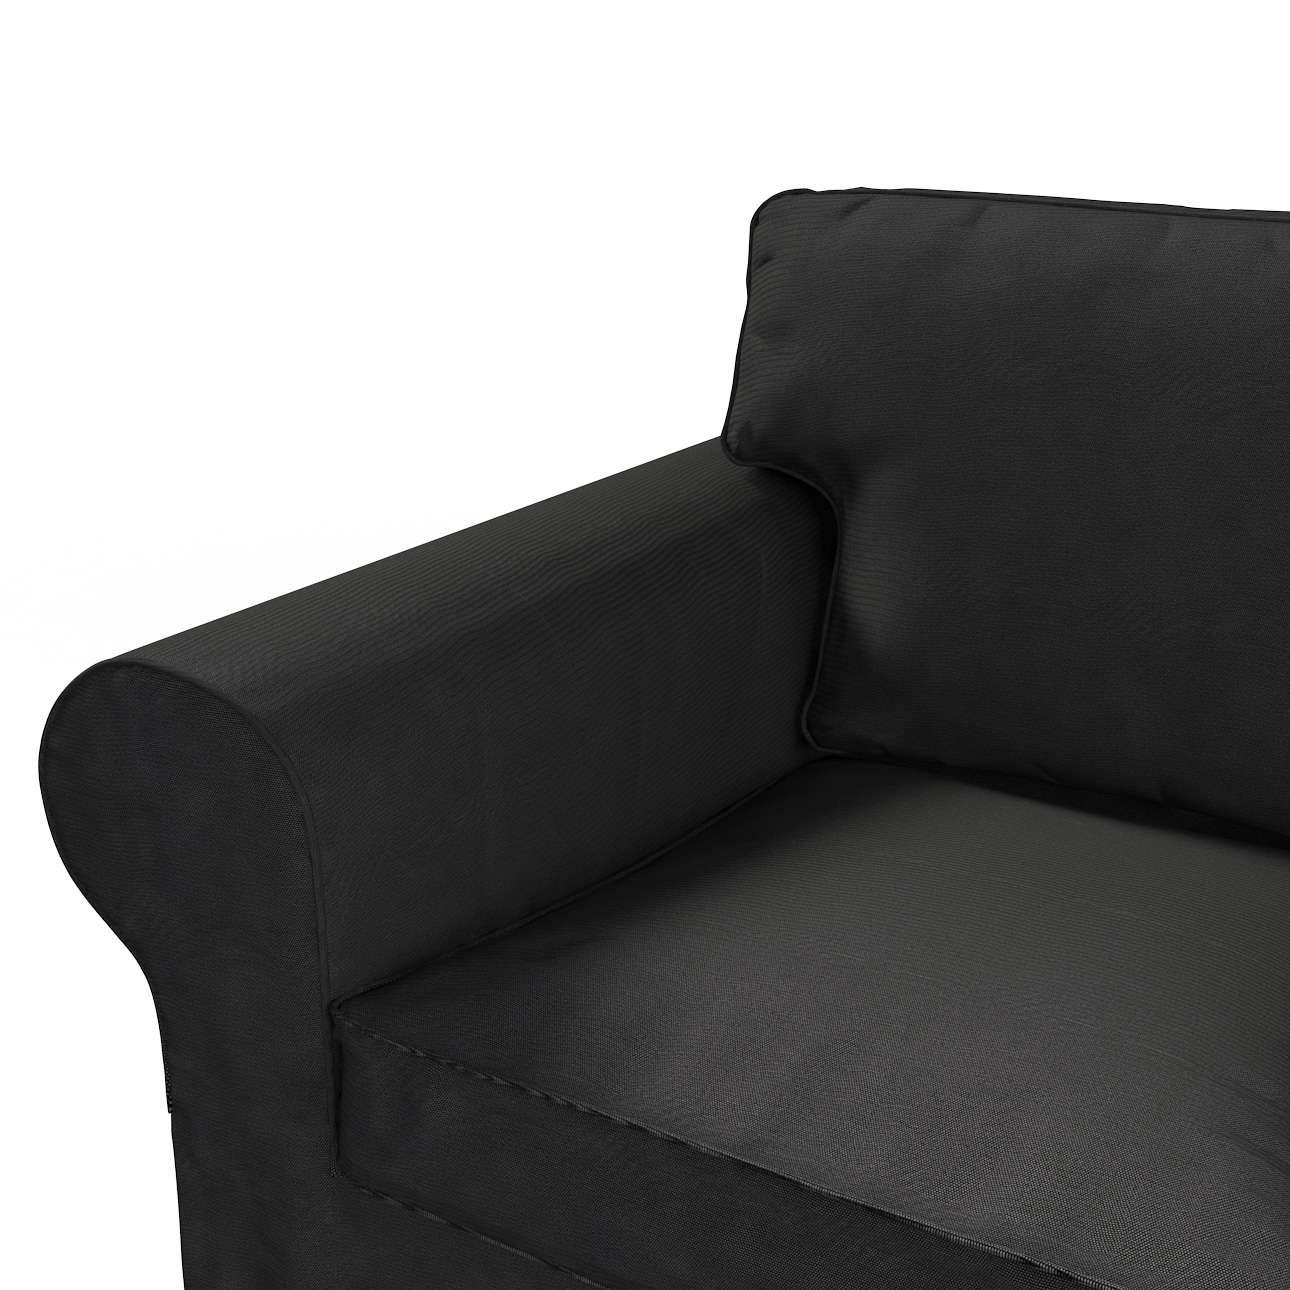 Ektorp 2-Sitzer Schlafsofabezug  ALTES Modell Sofabezug Ektorp 2-Sitzer Schlafsofa altes Modell von der Kollektion Etna, Stoff: 705-00